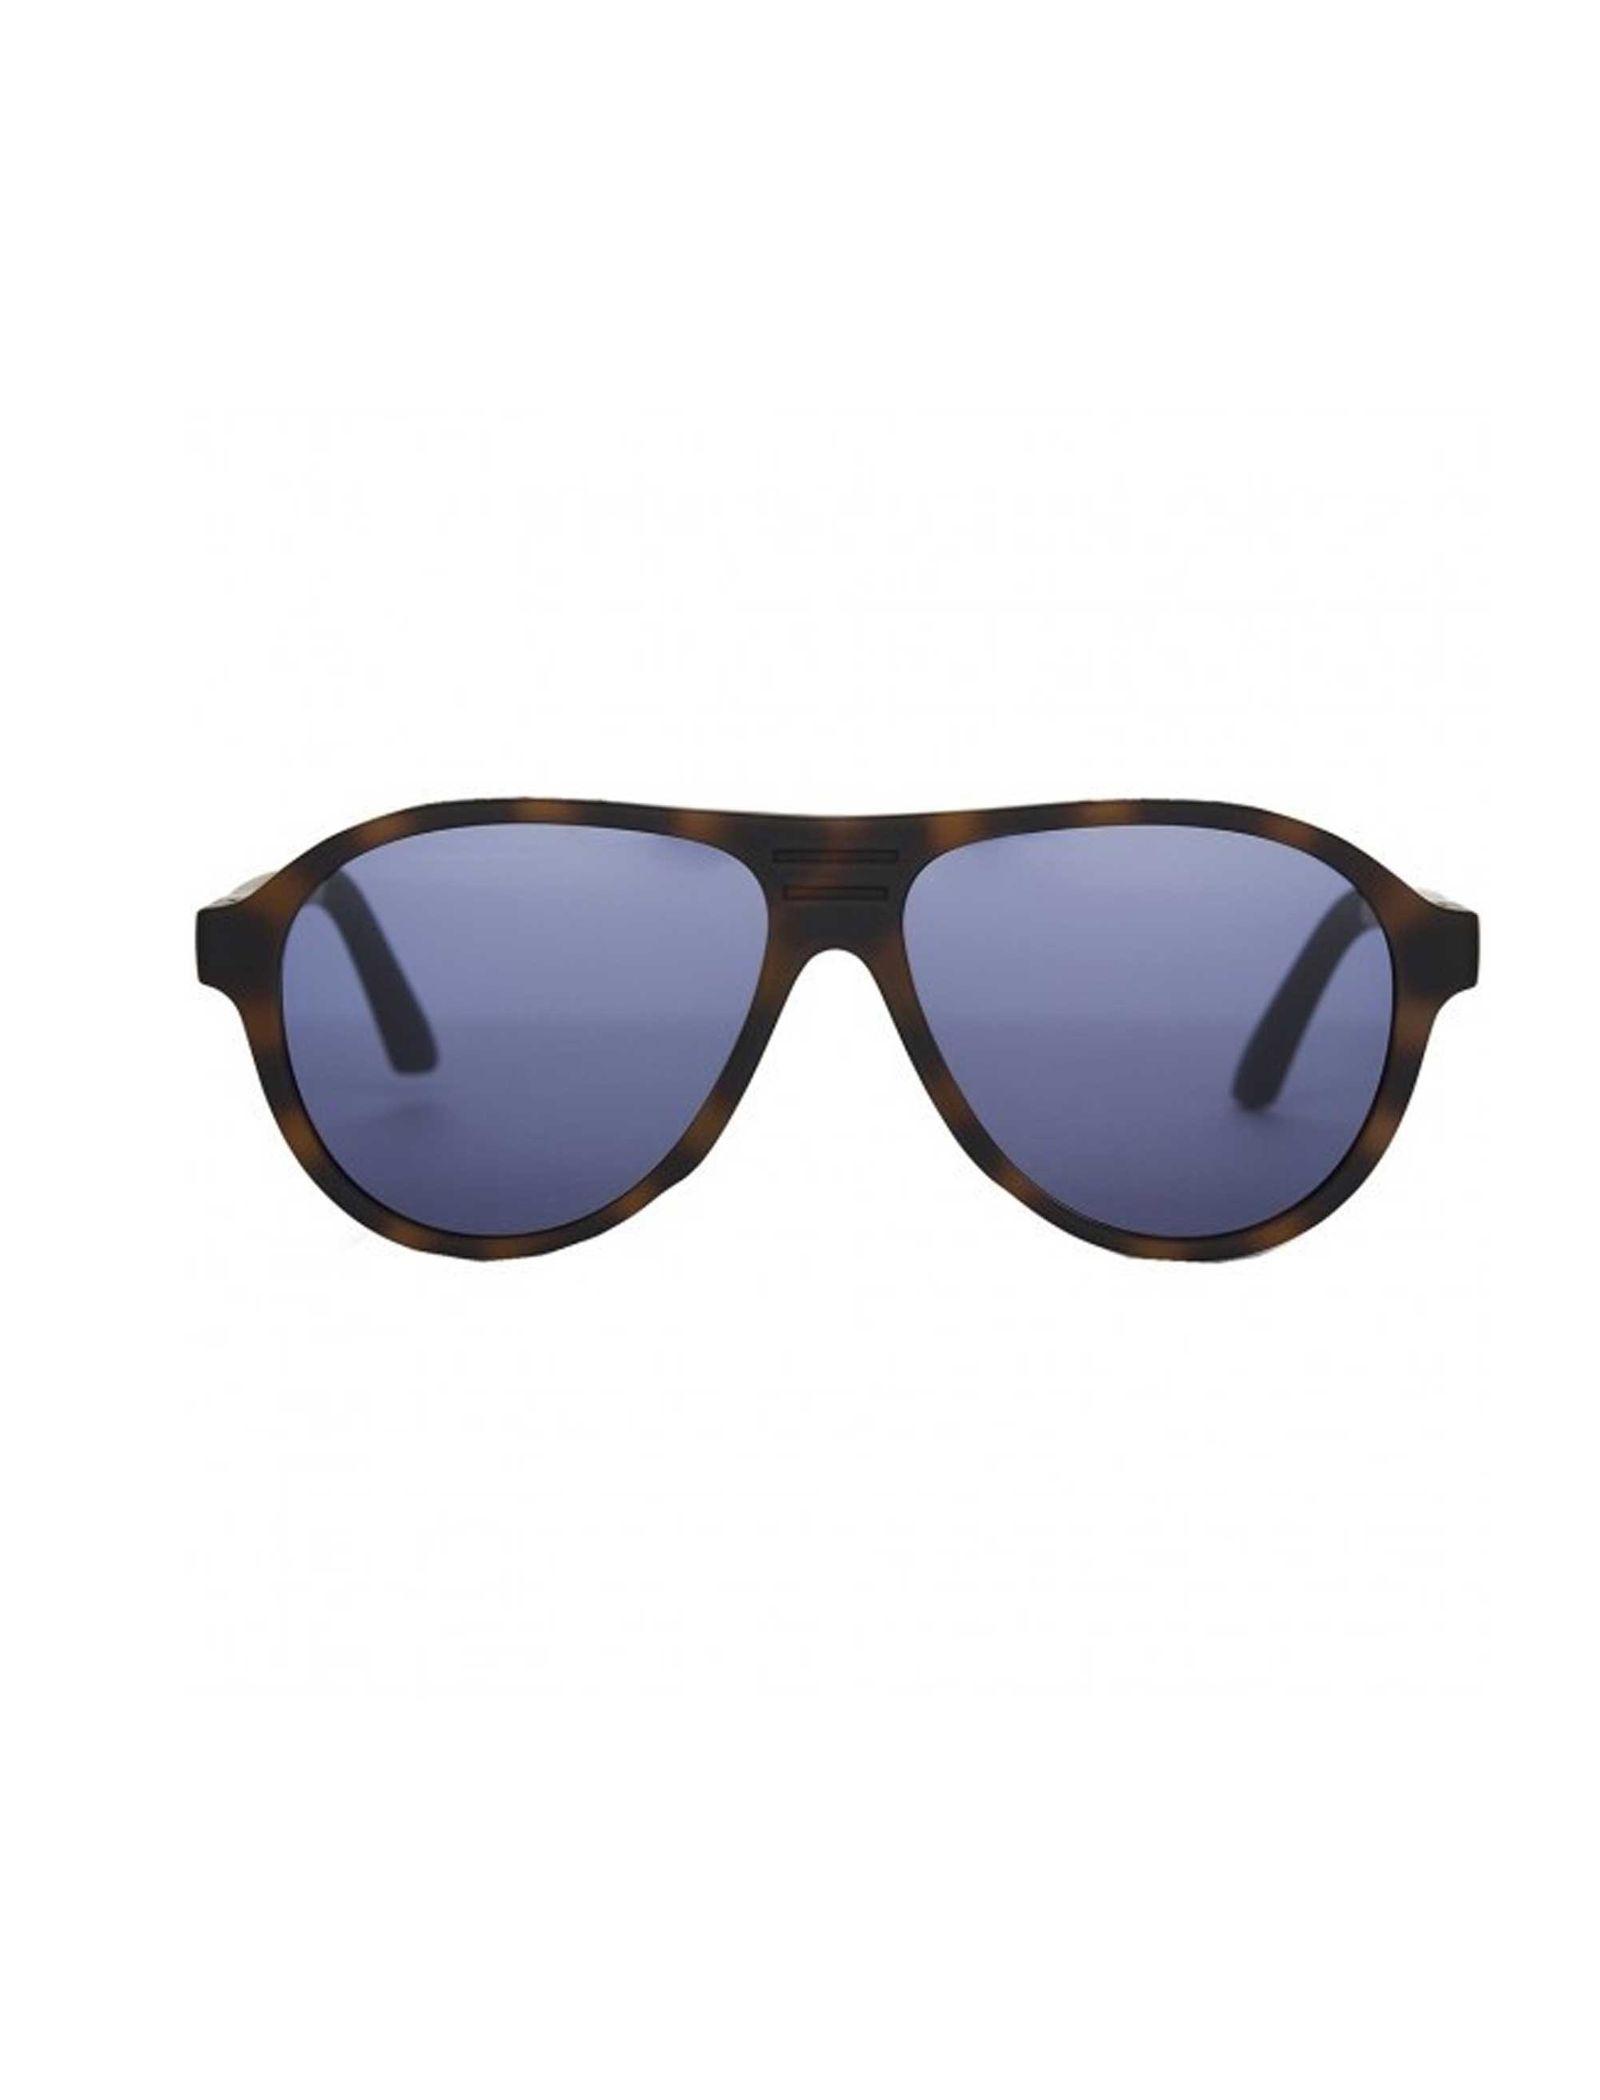 عینک آفتابی خلبانی بزرگسال ZION - تامز - قهوه اي - 4